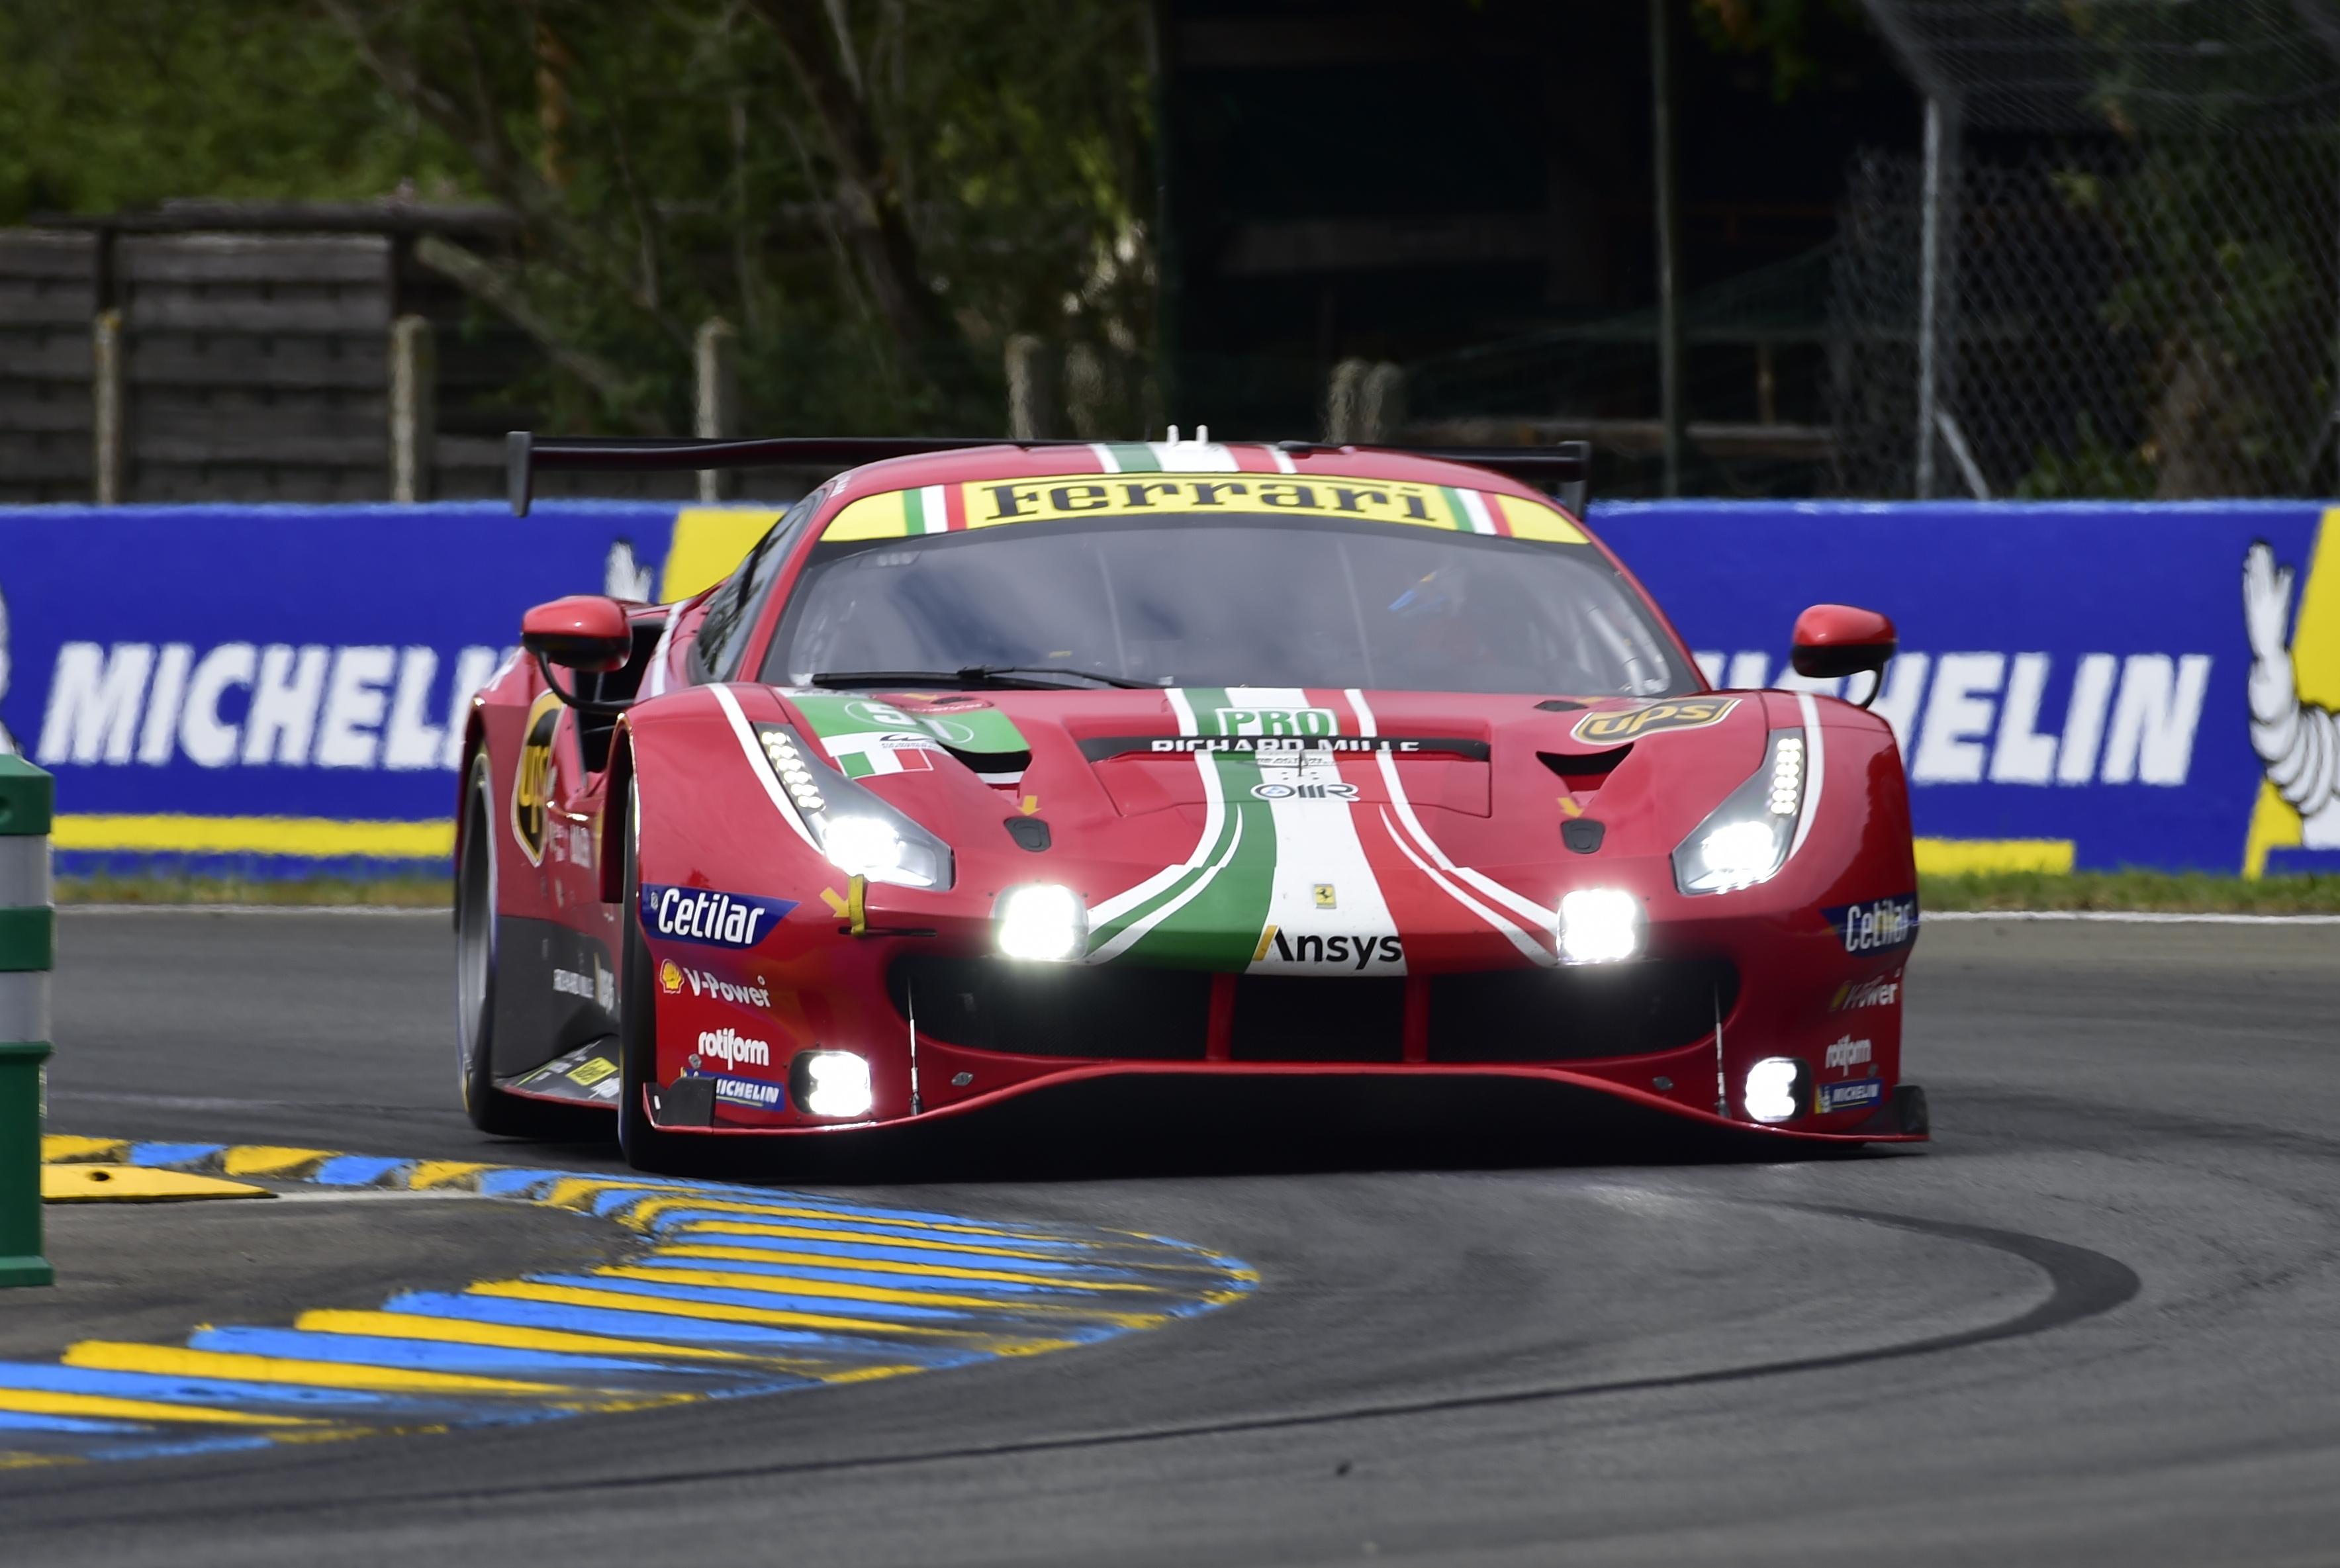 #51 Ferrari - James Calado, Alessandro Pier Guidi, Come Ledogar [credit: Andrew Hartley]